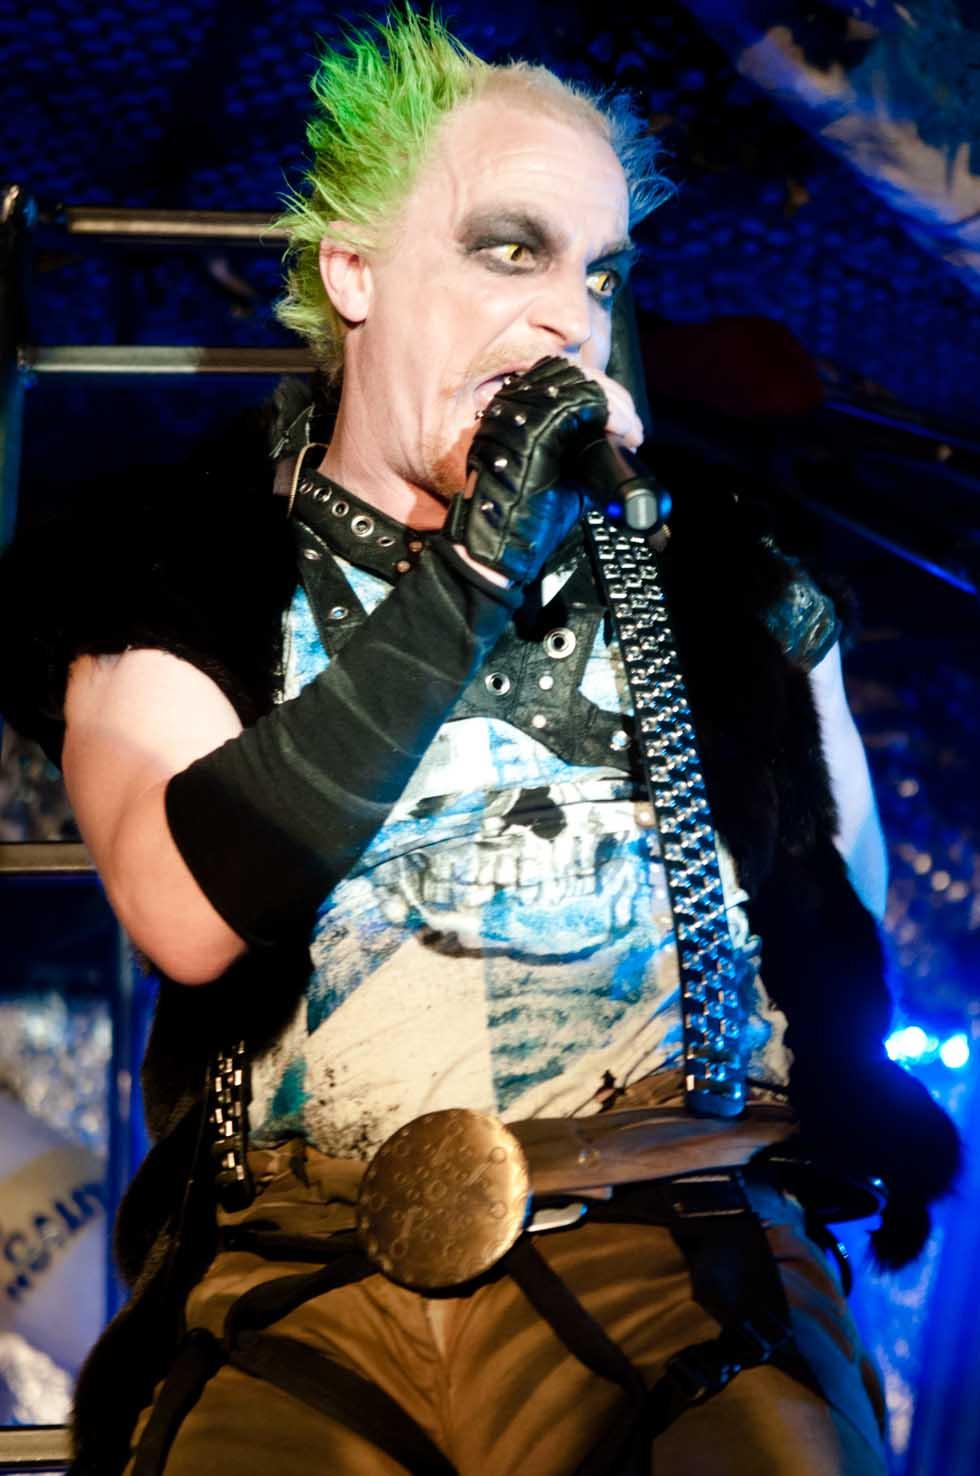 zum-schneider-nyc-2012-karneval-apocalyptika-3983.jpg